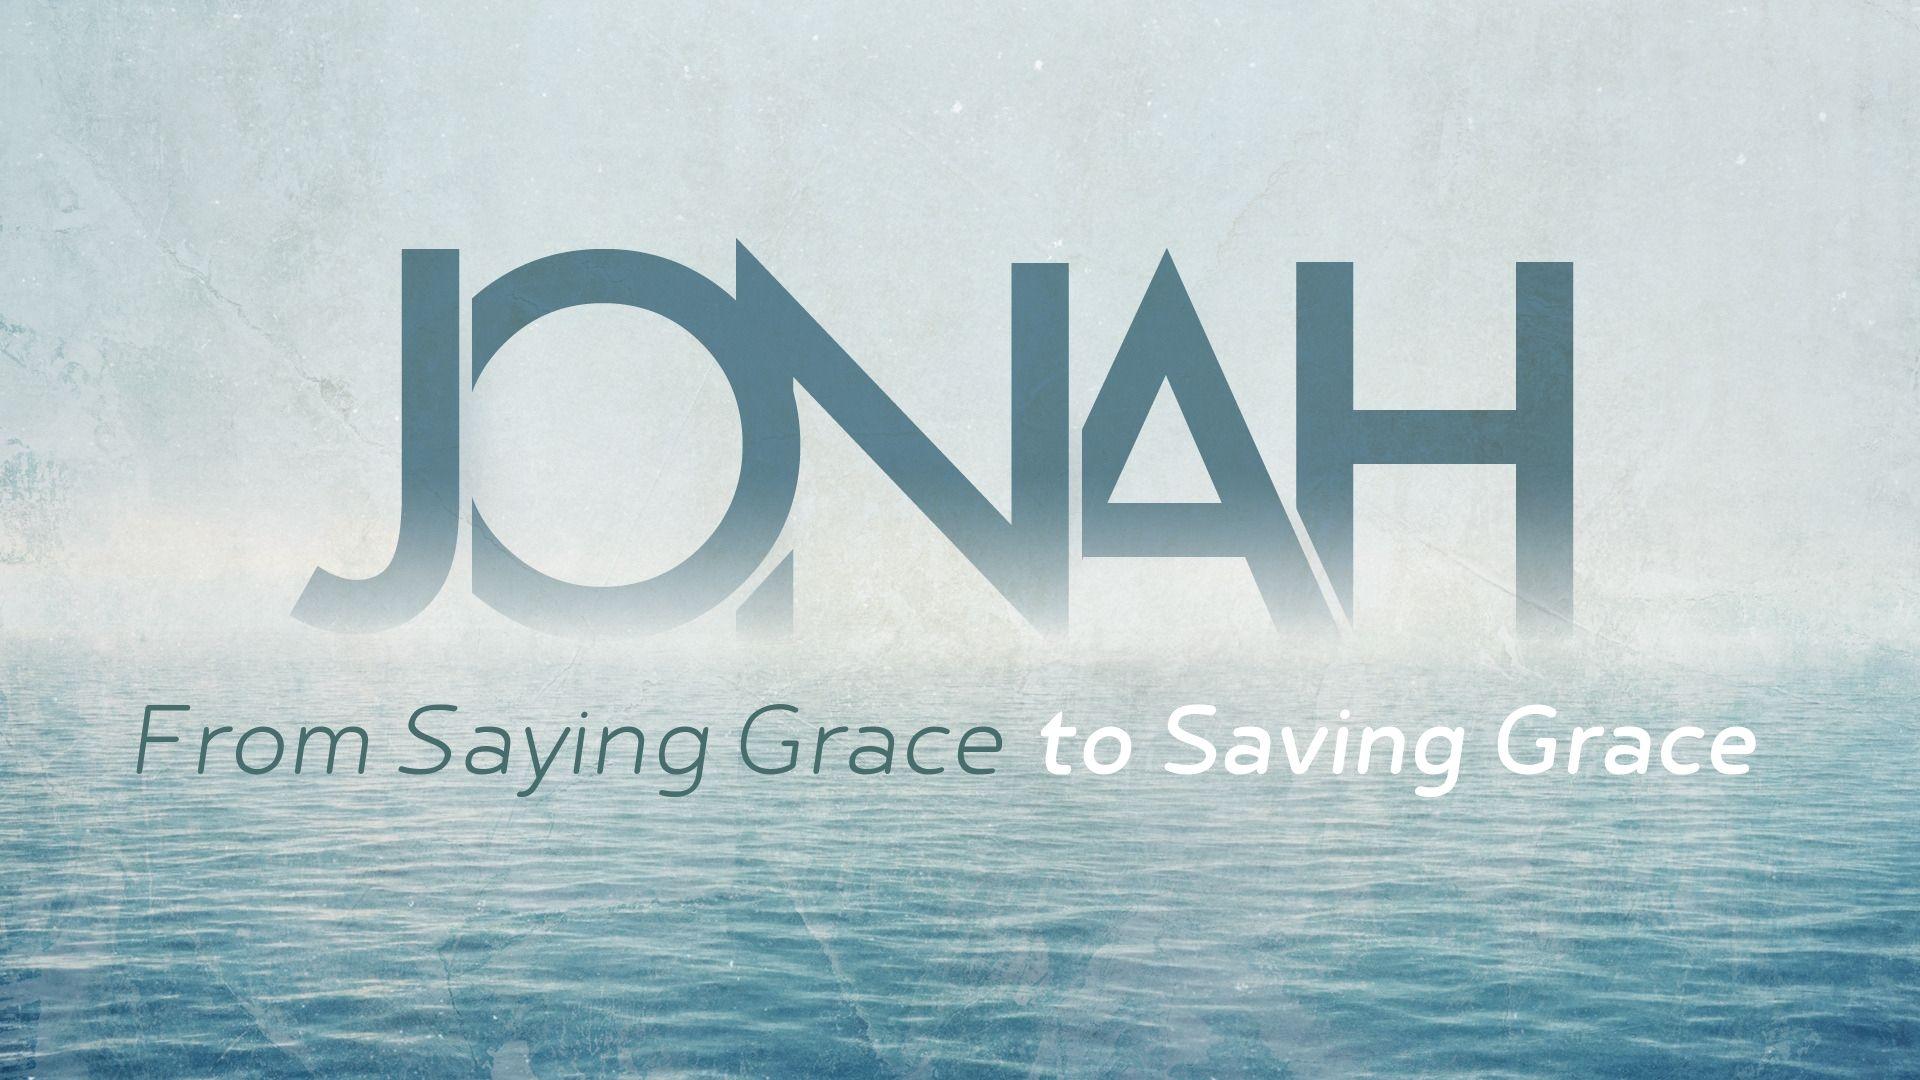 Jonah Title 1.jpg